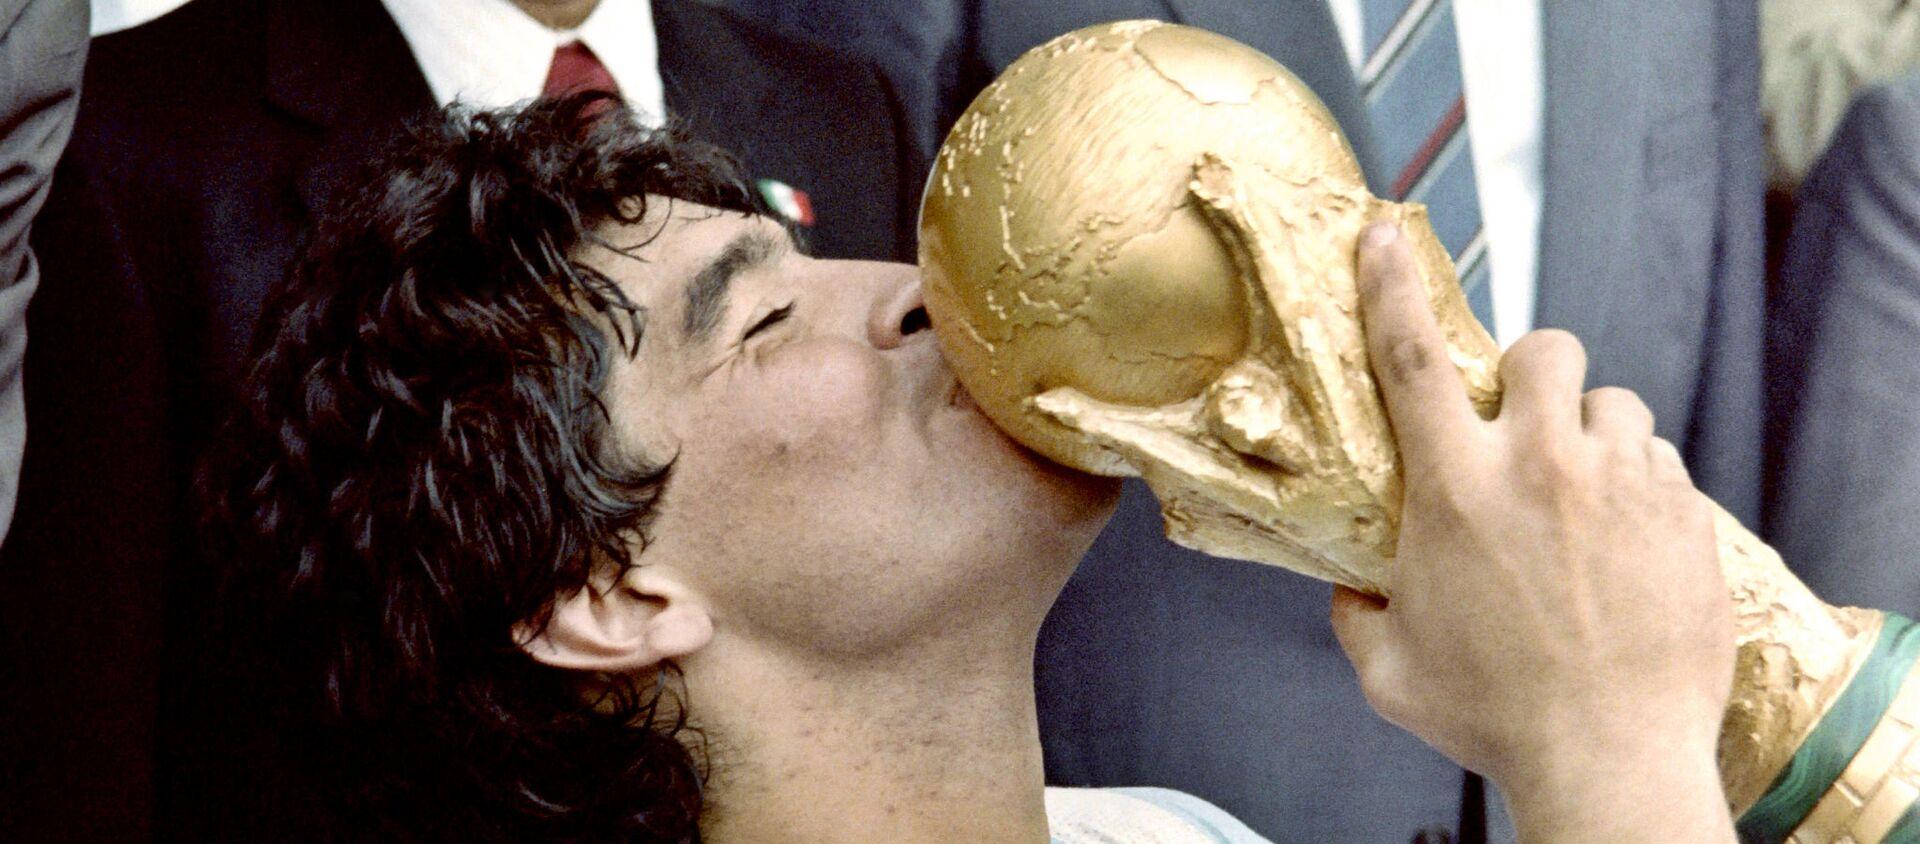 Diego Maradona durante la Copa Mundial en México, 1986 - Sputnik Mundo, 1920, 25.11.2020